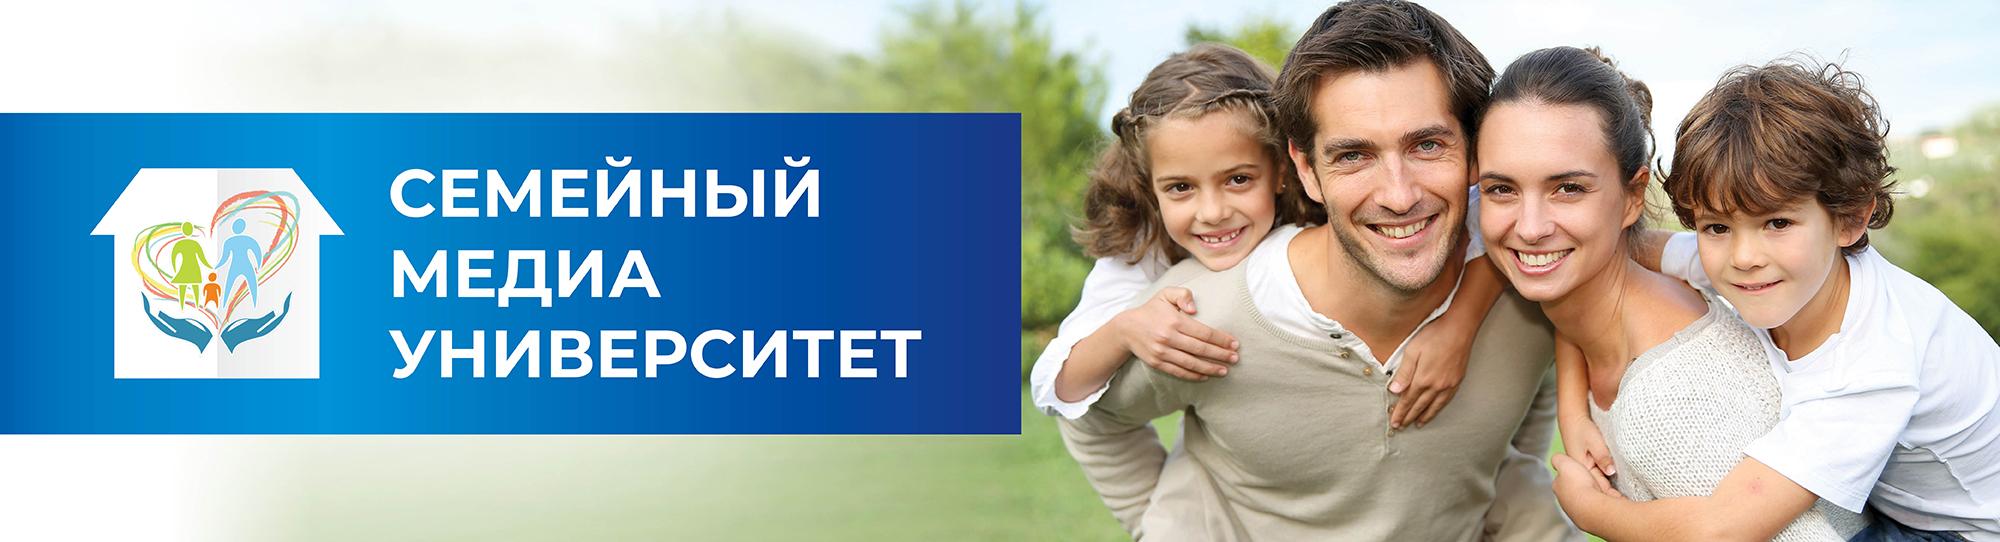 Semeyniy_mediauniver6